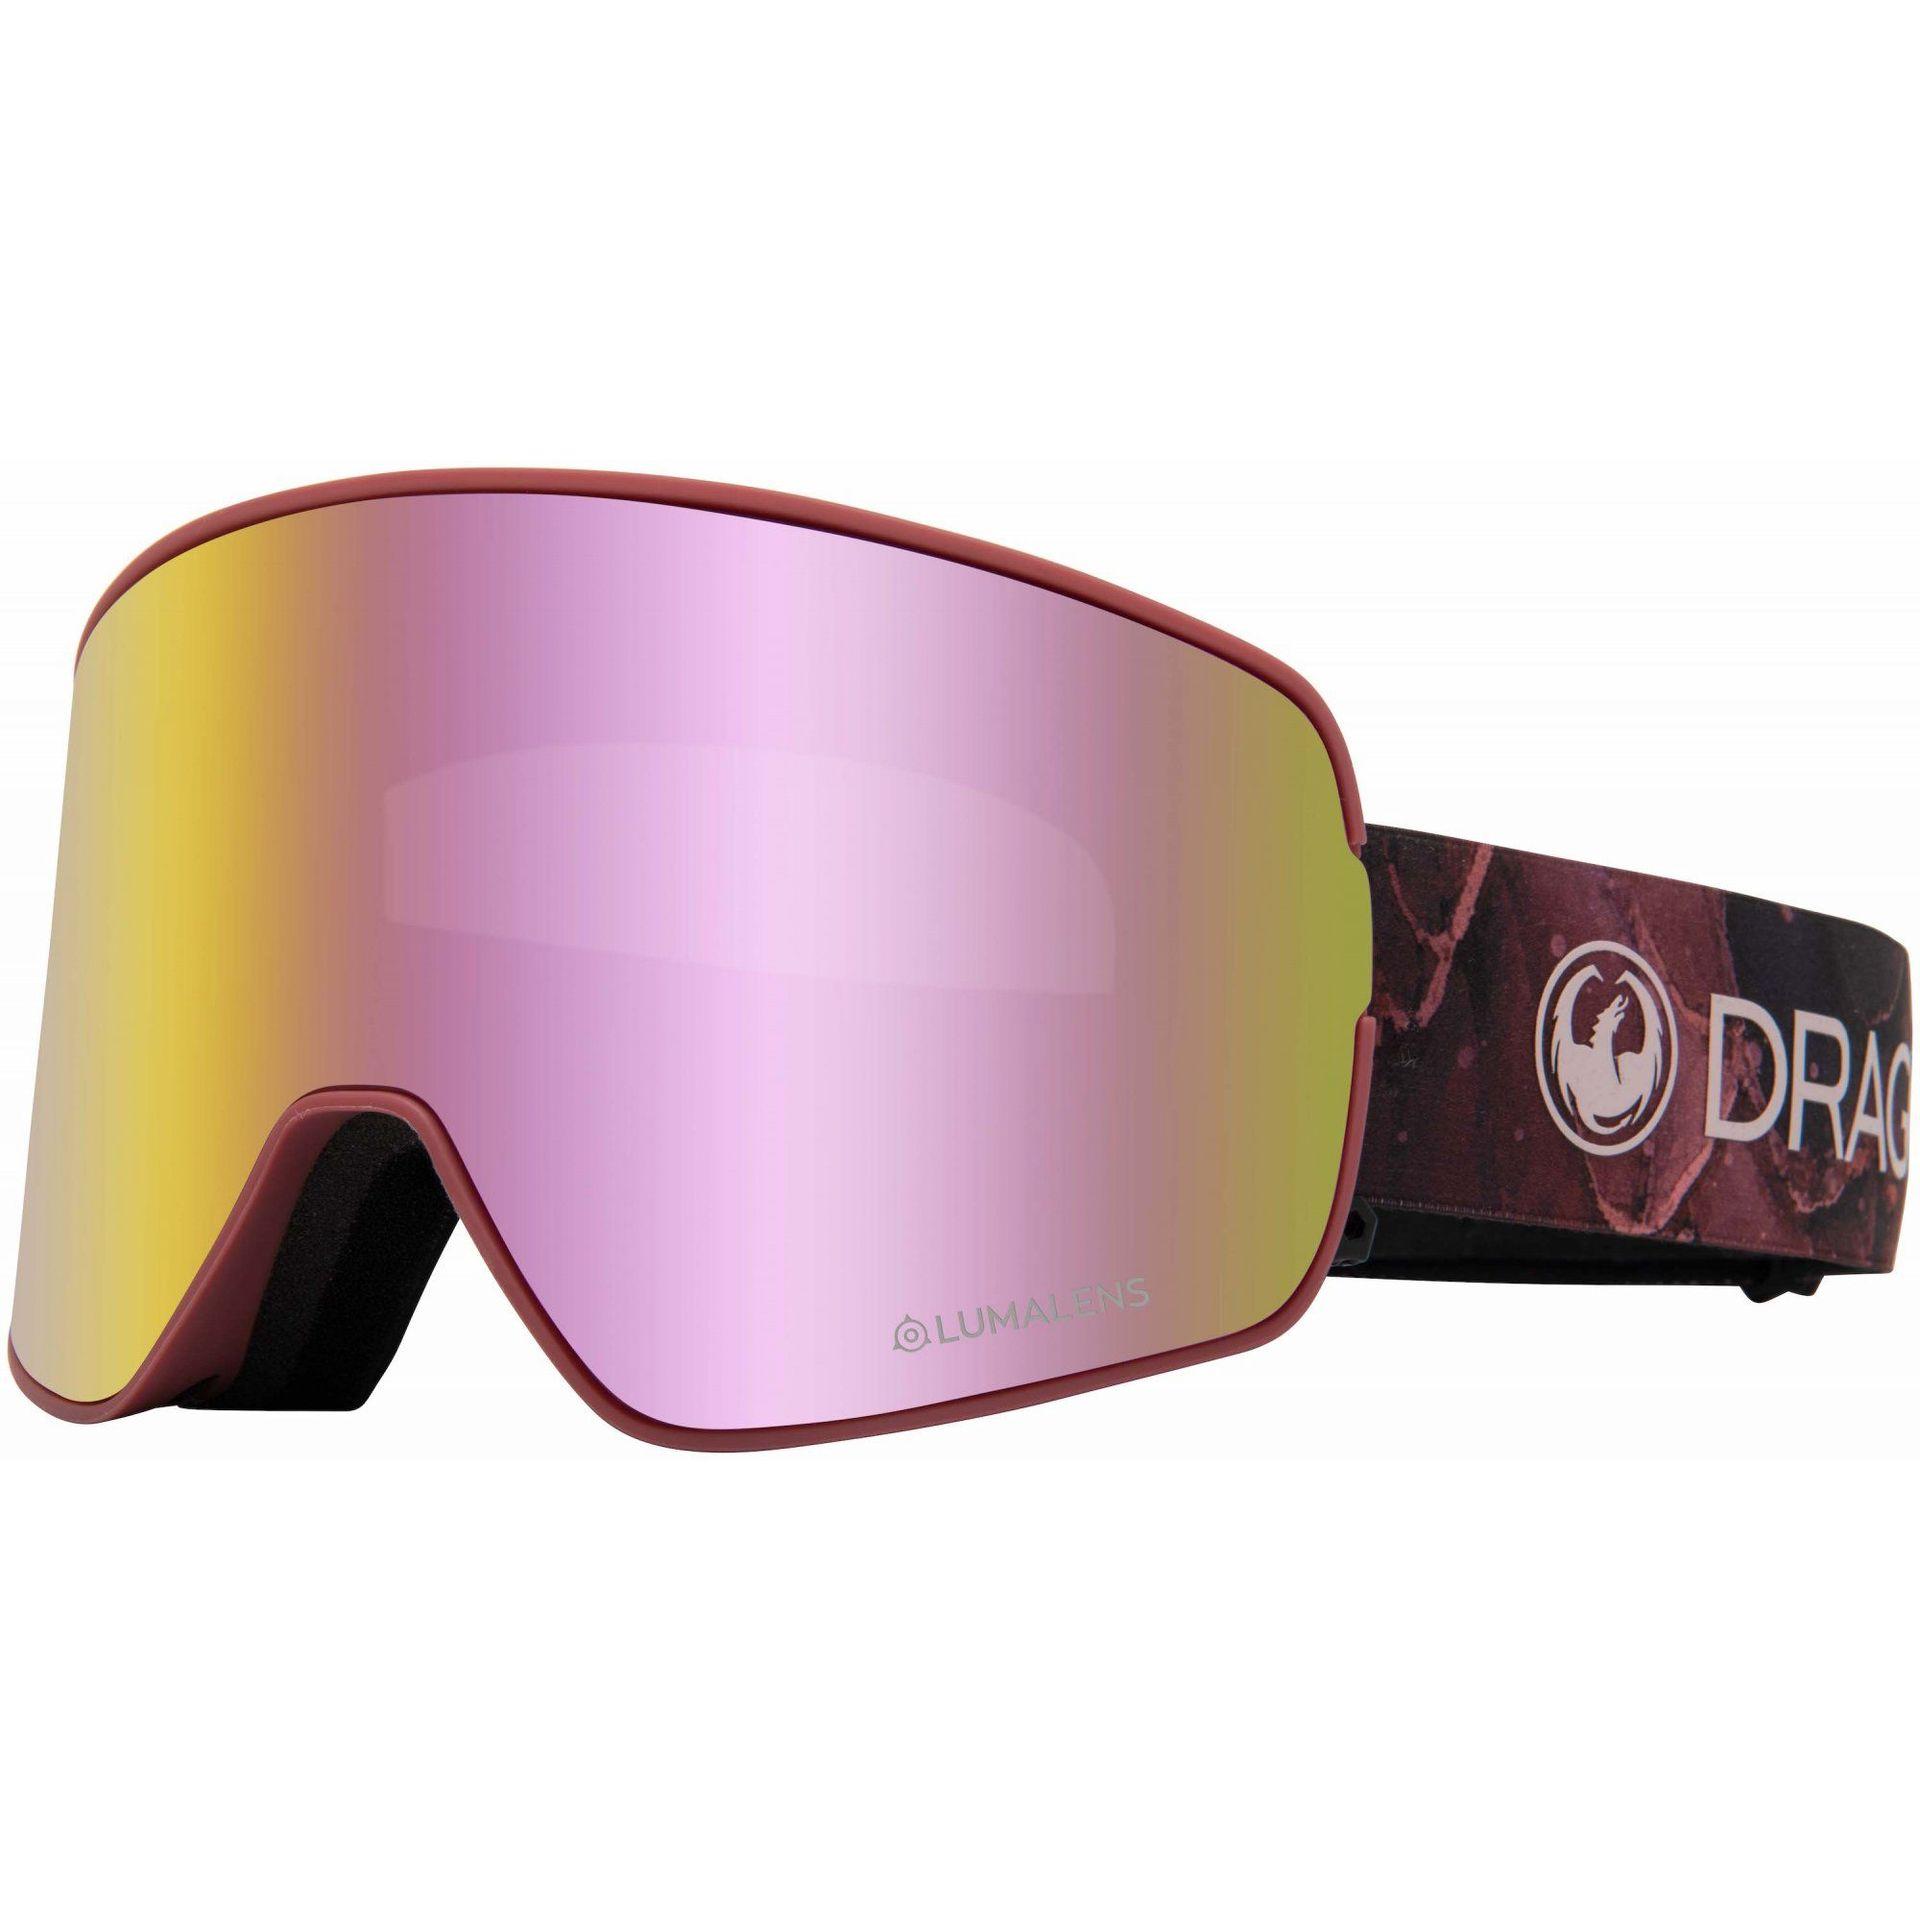 GOGLE DRAGON NFX2 ROSE PINK ION 1